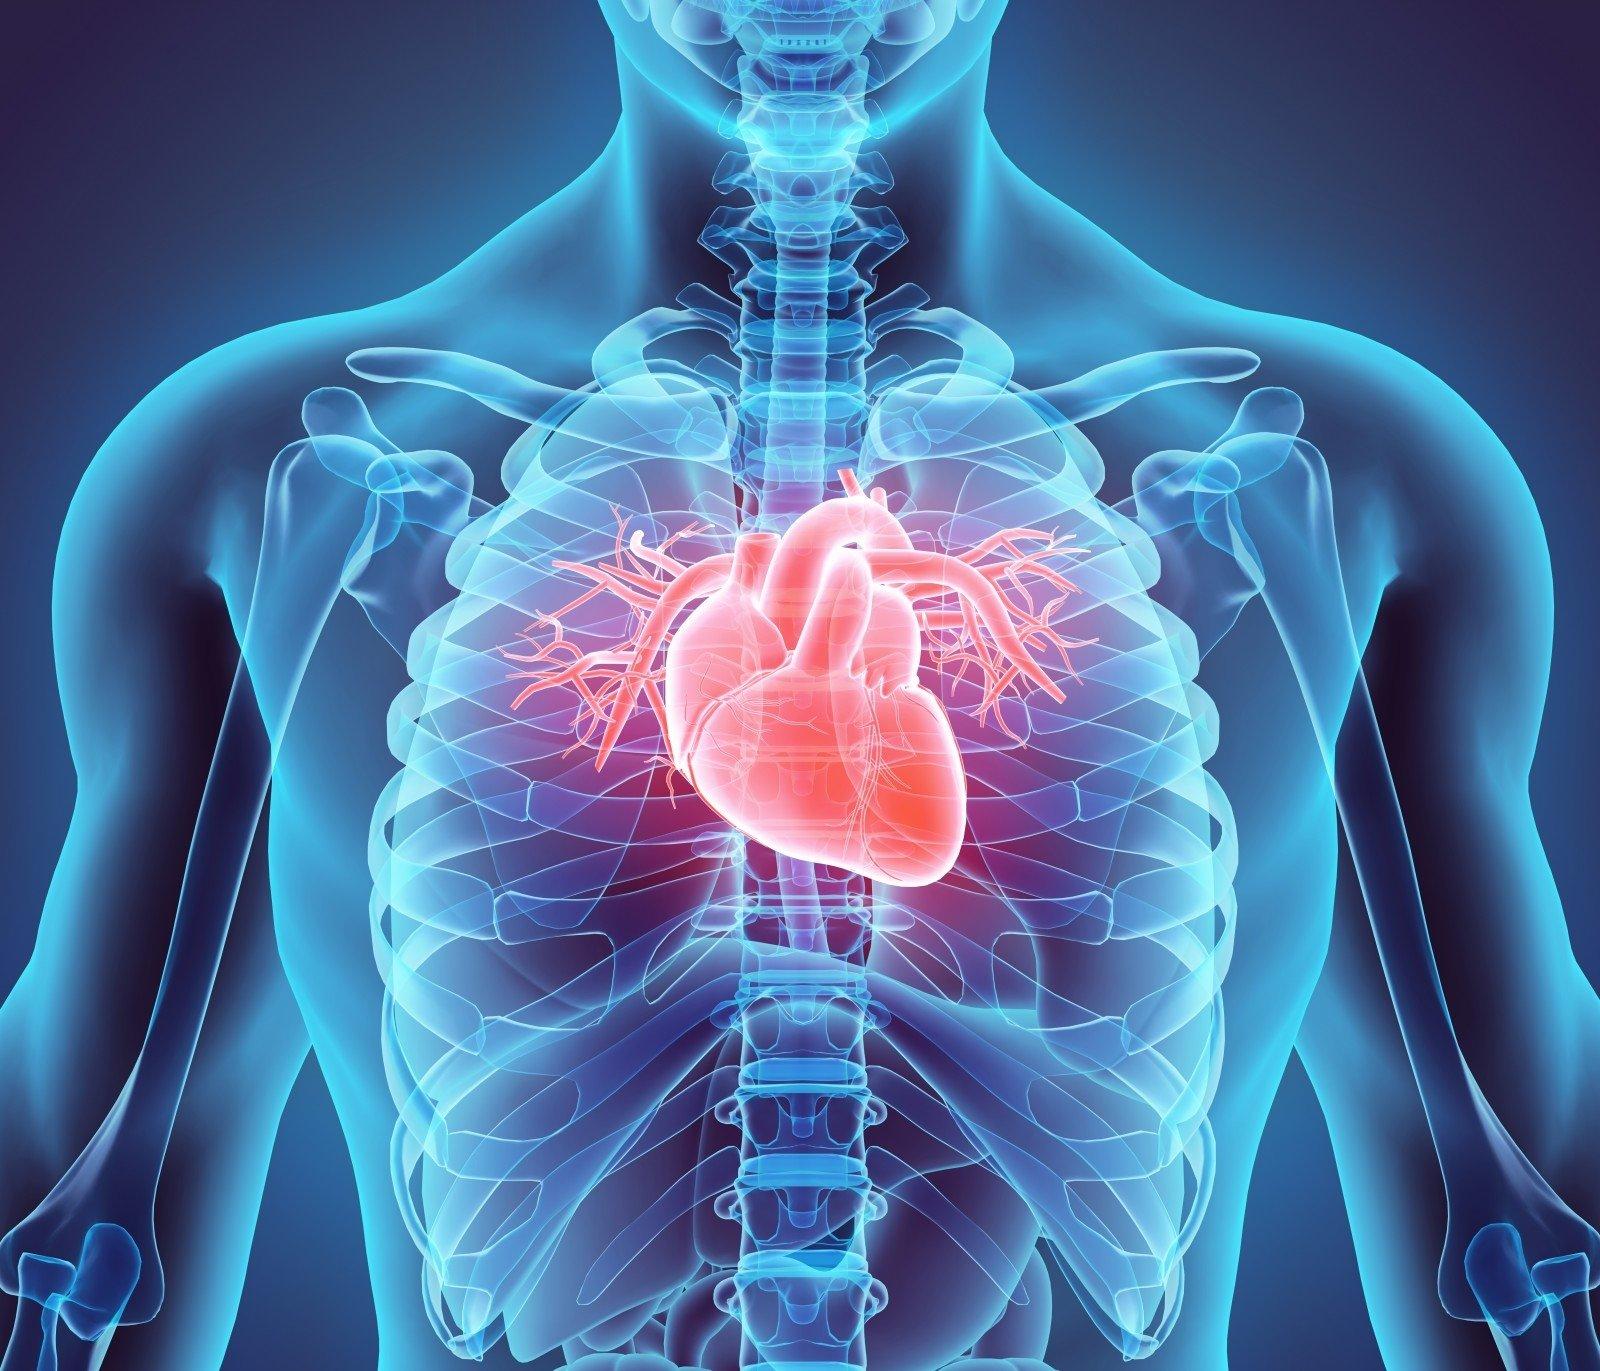 širdies sveikatos pranašumas)